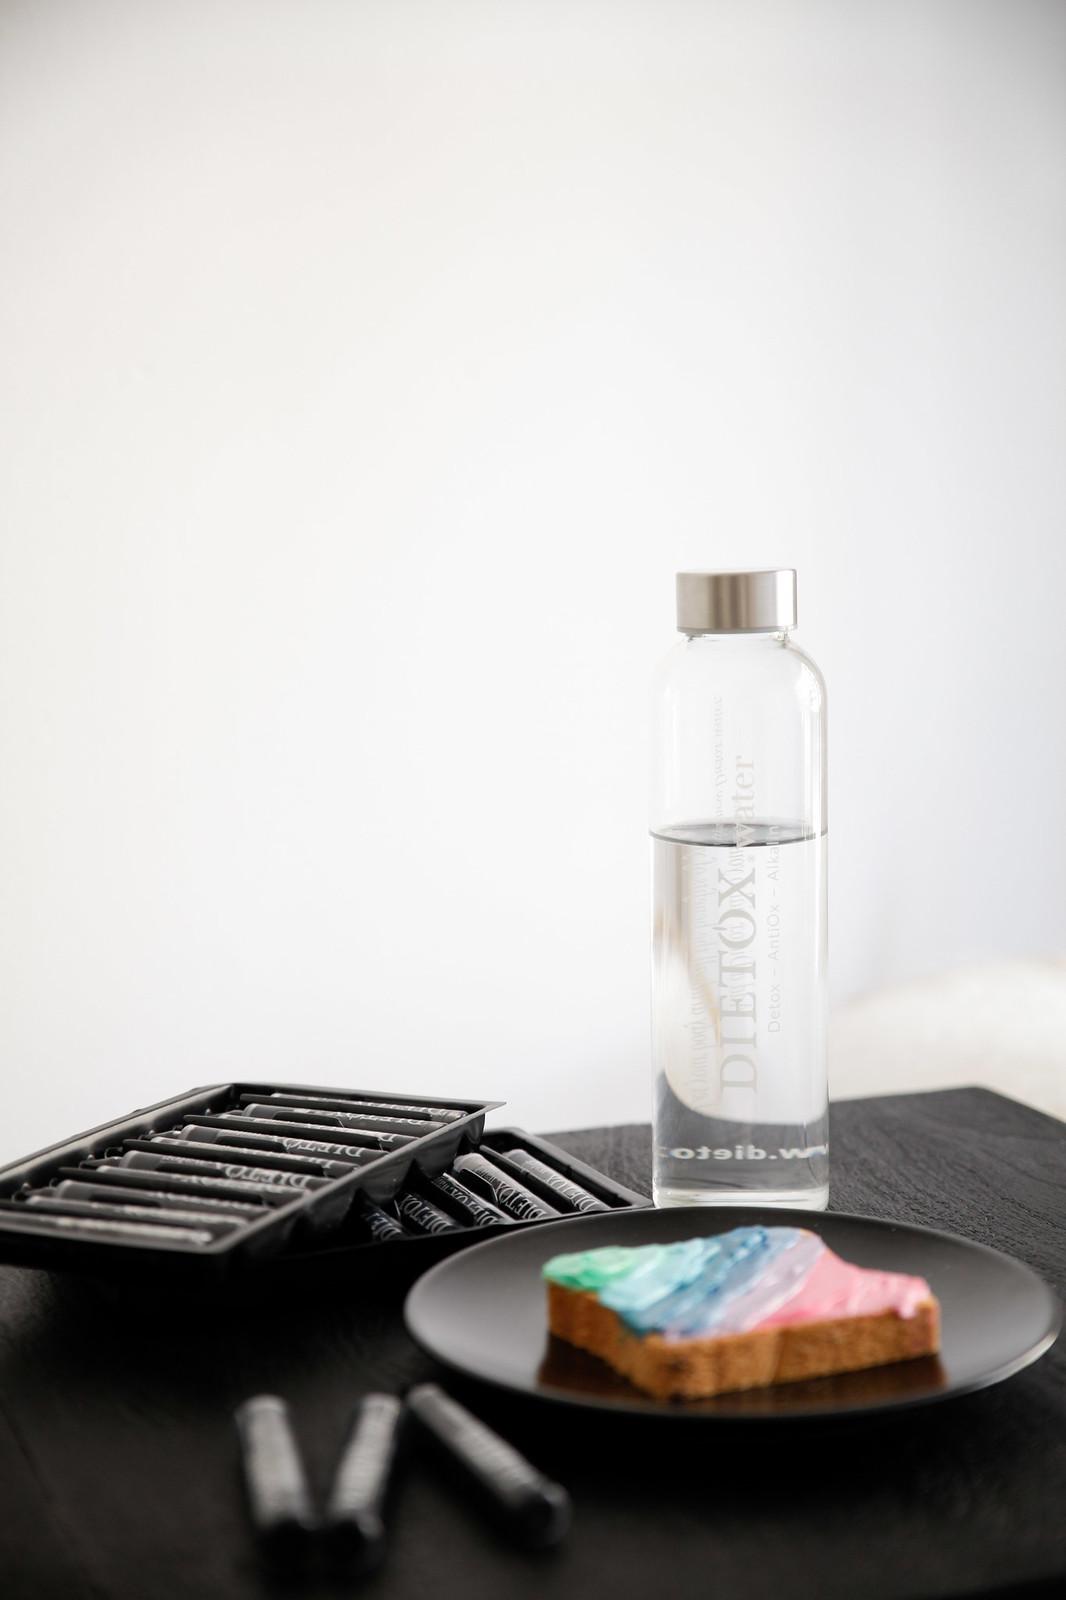 07_agua_alcalina_dietox_water_healthy_water_theguestgirl_black_water_agua_negra